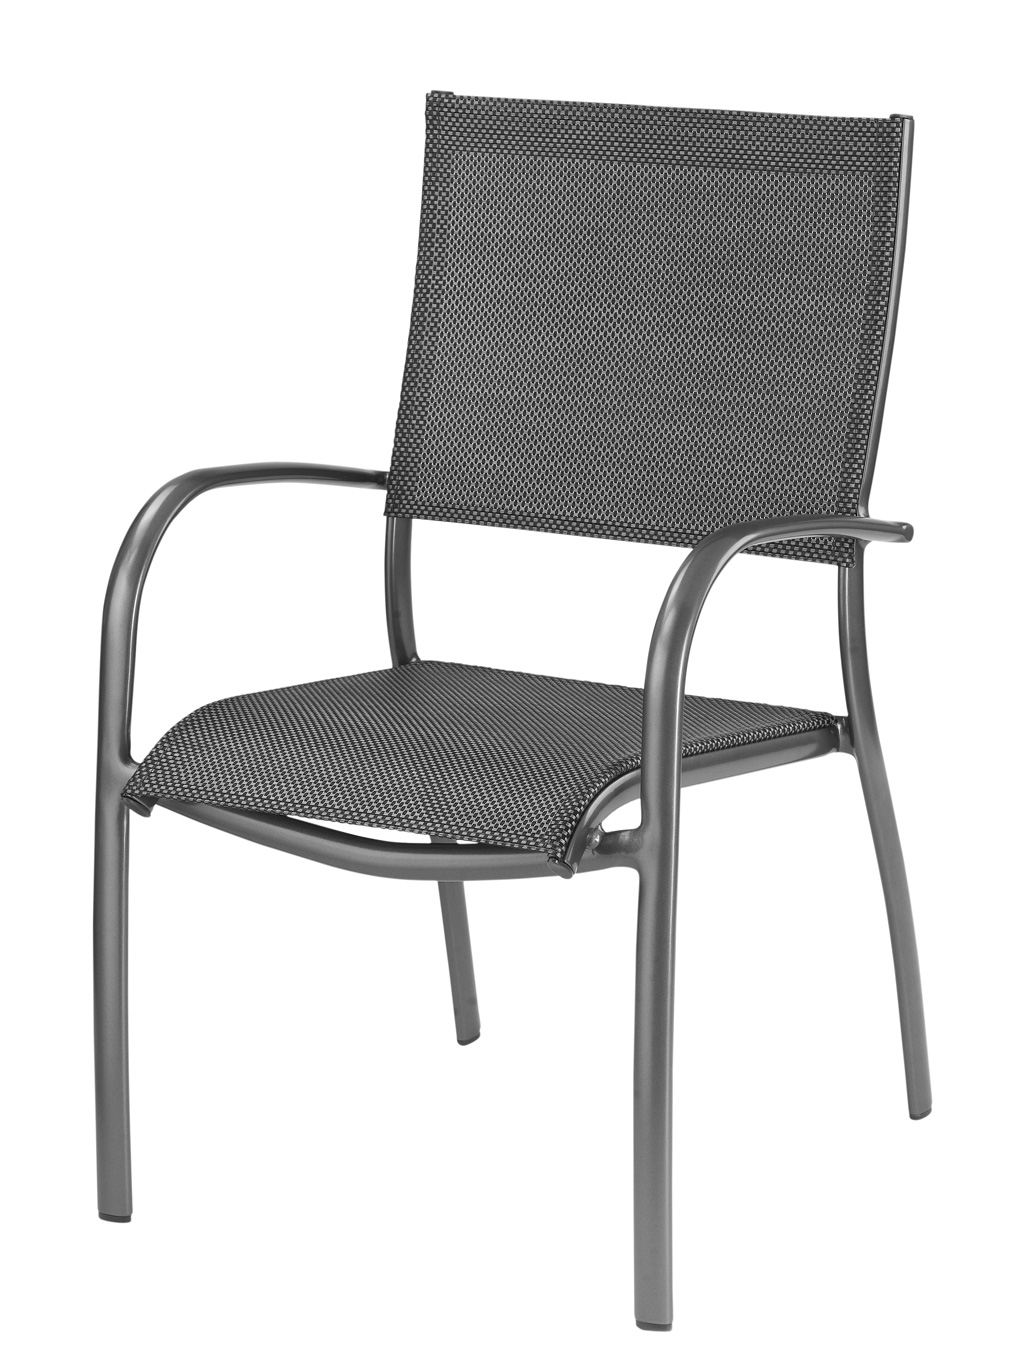 fauteuil elegance oc o sun mobilier. Black Bedroom Furniture Sets. Home Design Ideas